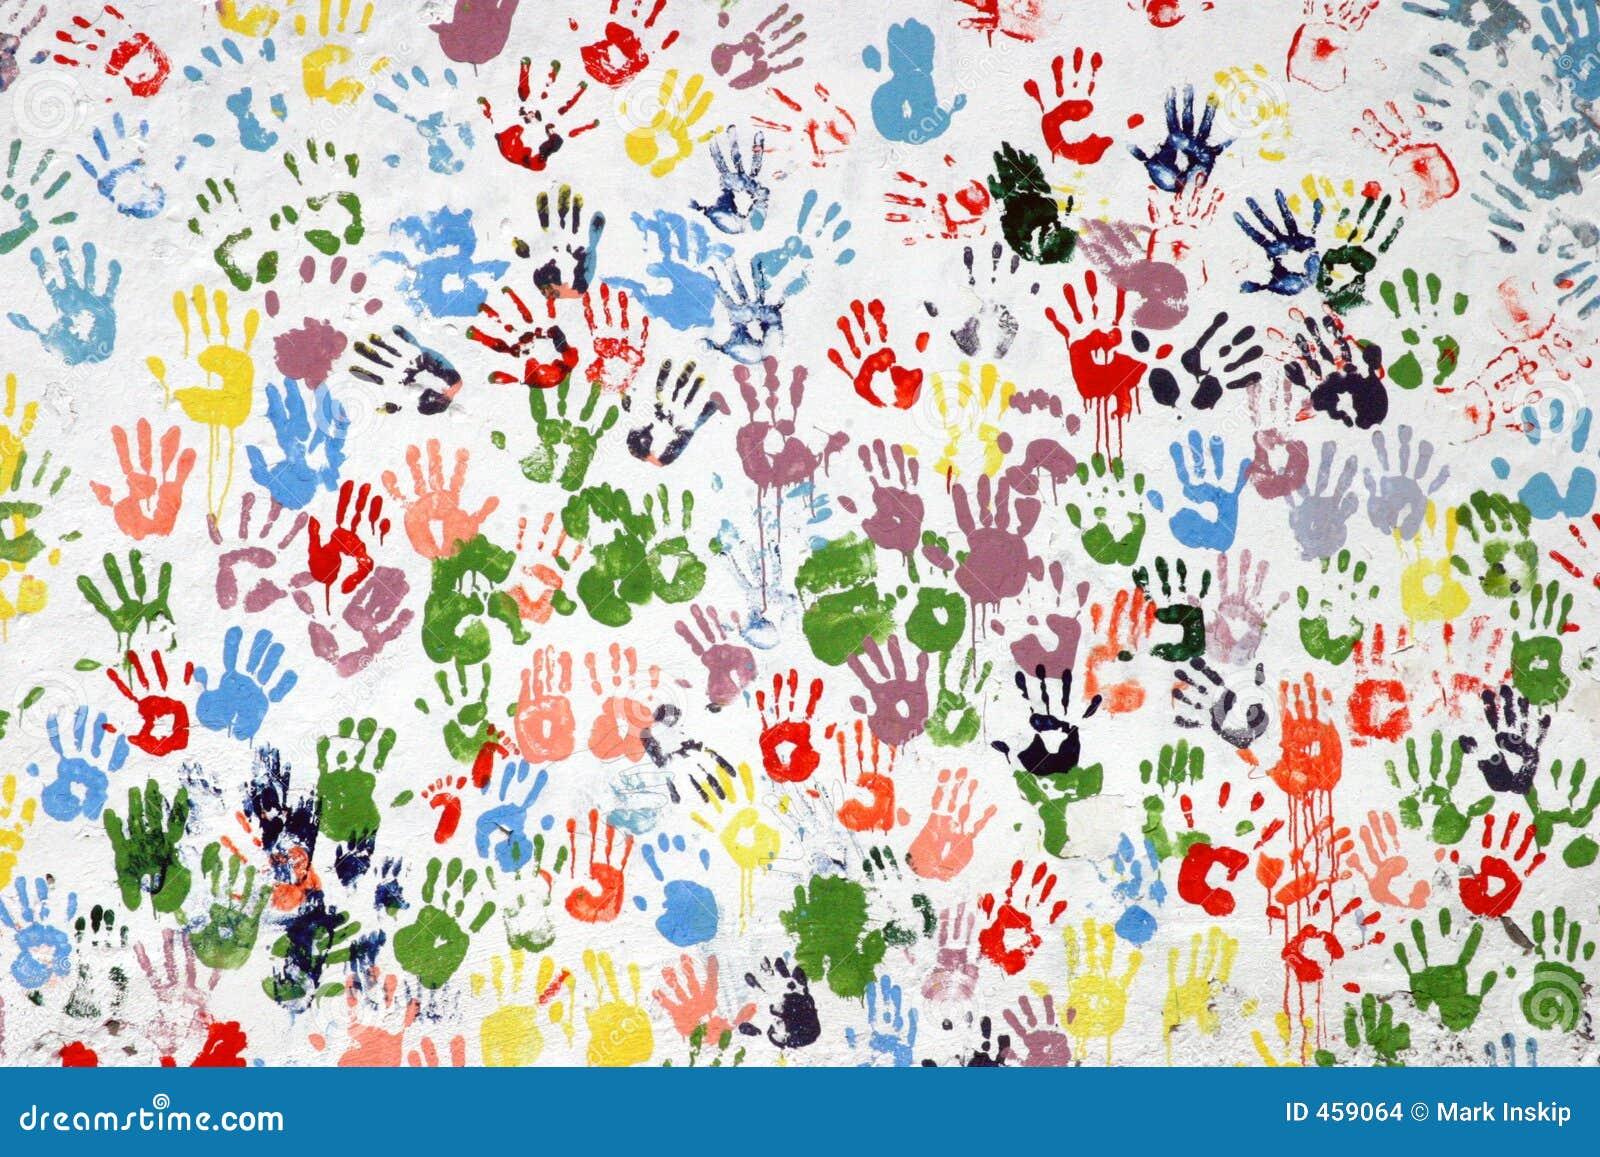 Colorful hand-prints